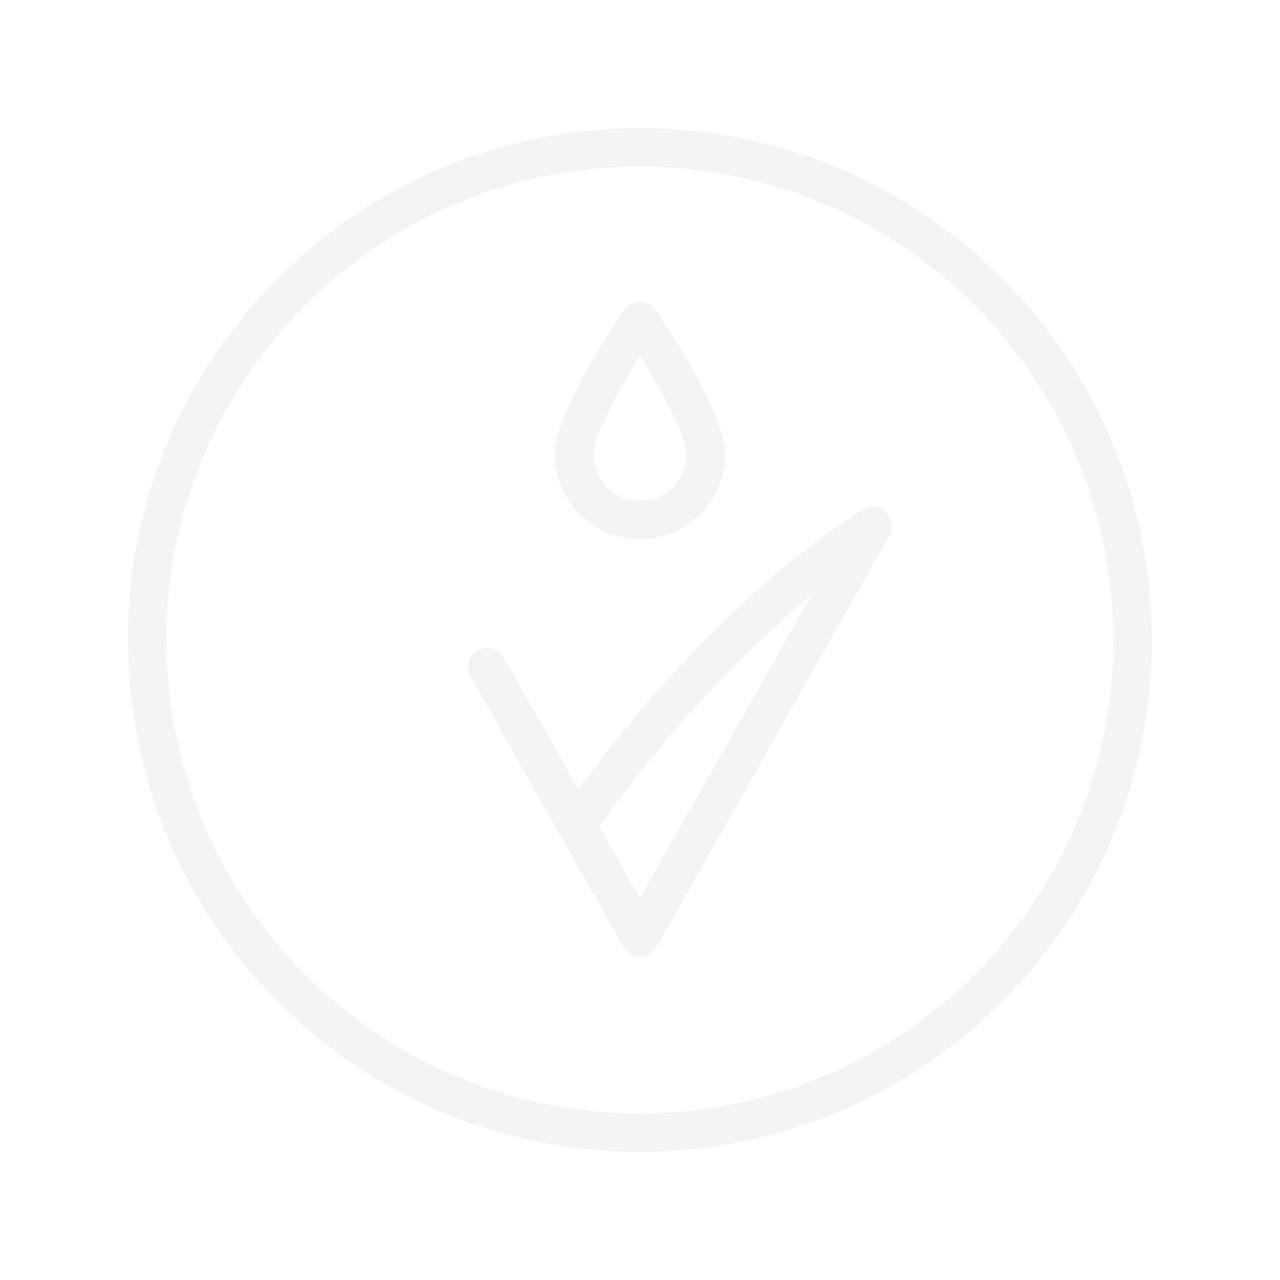 DR. HAUSCHKA Loose Powder No.00 Translucent 12g